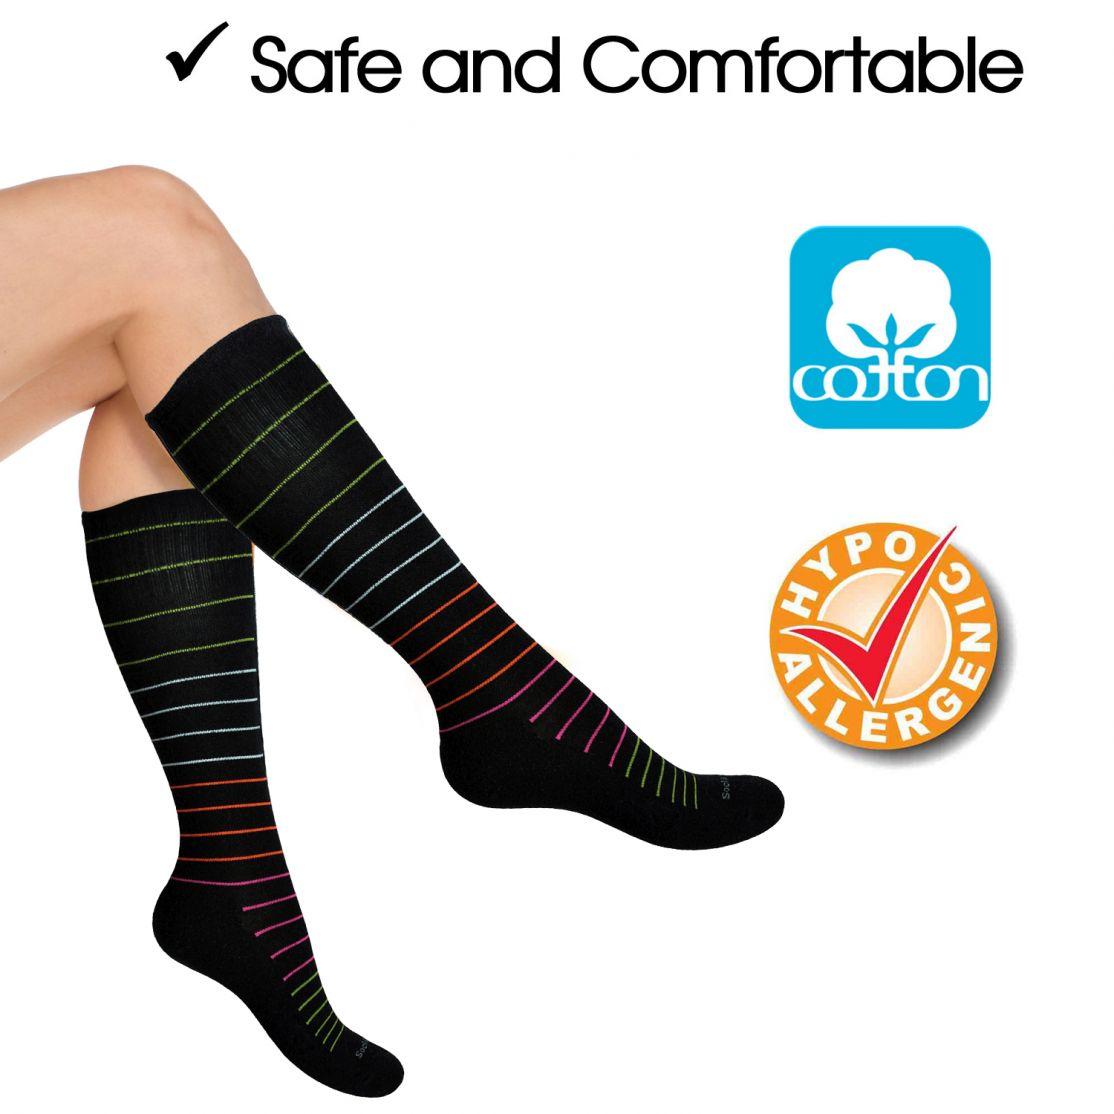 cotton compression socks SocksLane